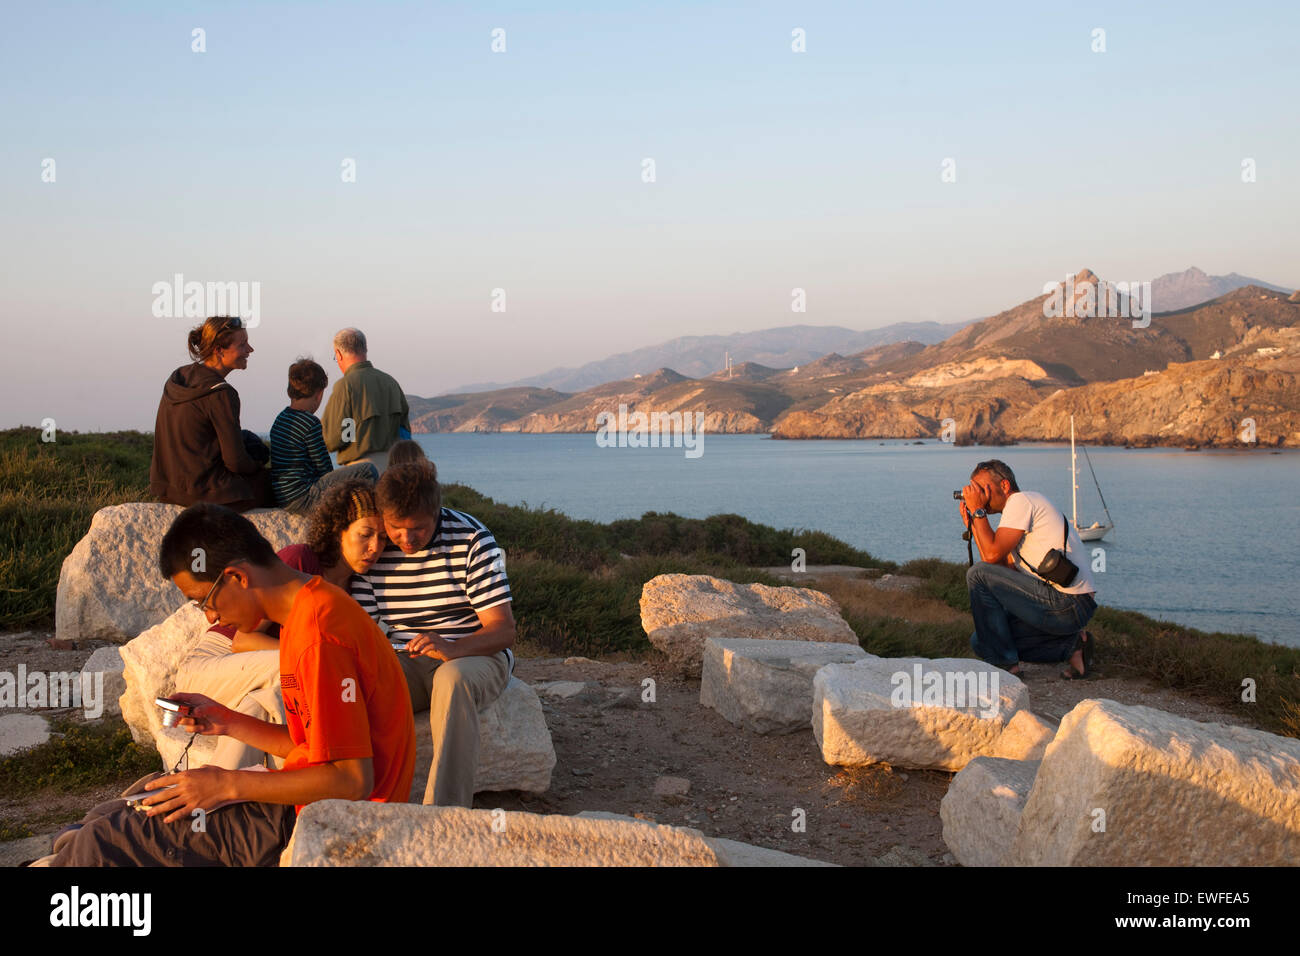 Griechenland, Kykladen, Naxos, Naxos-Stadt, am Apollon-Tempel auf der Halbinsel Sto Palati Stock Photo